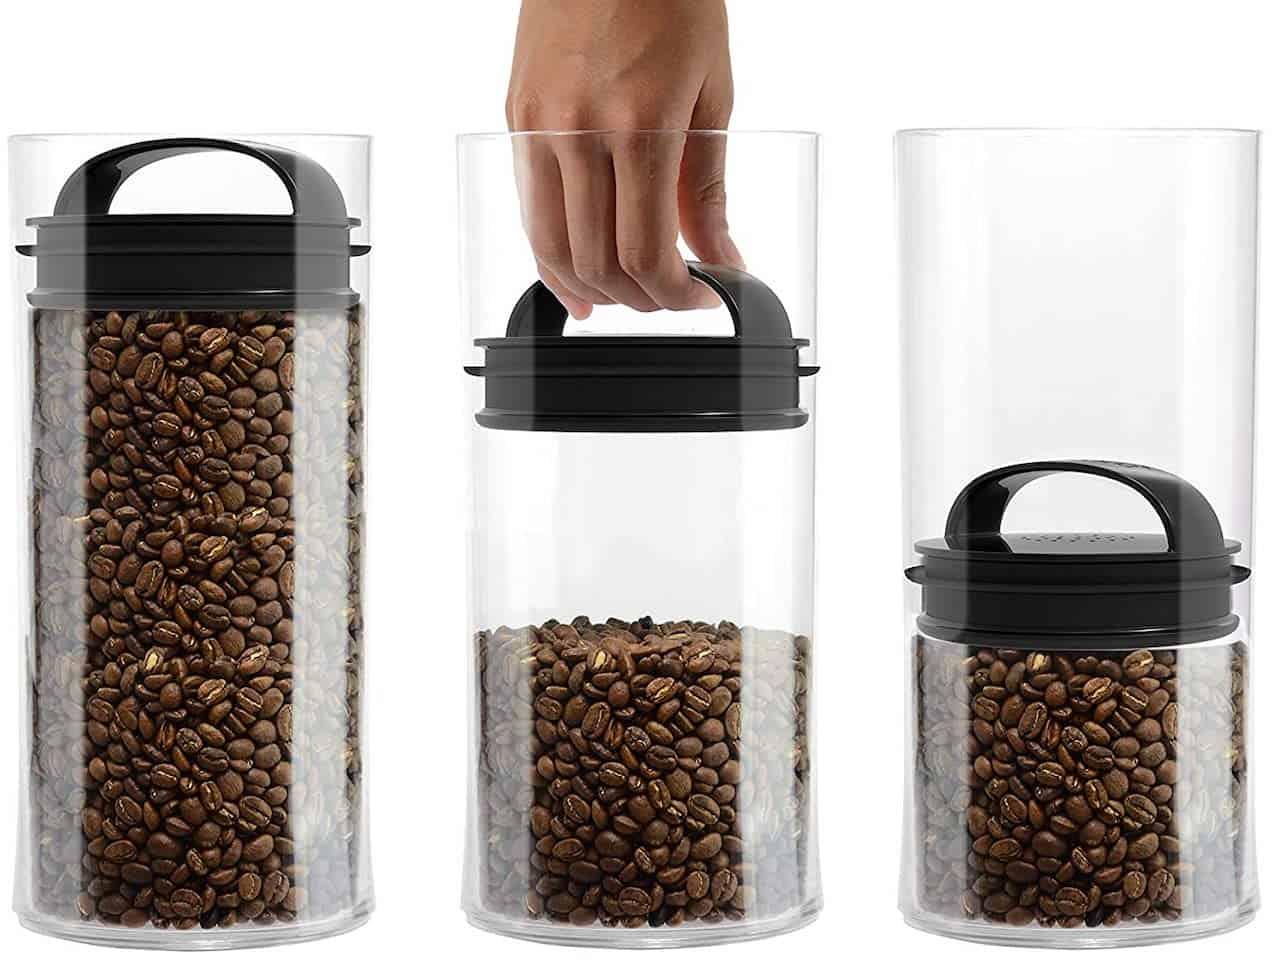 eval tea strorage containers